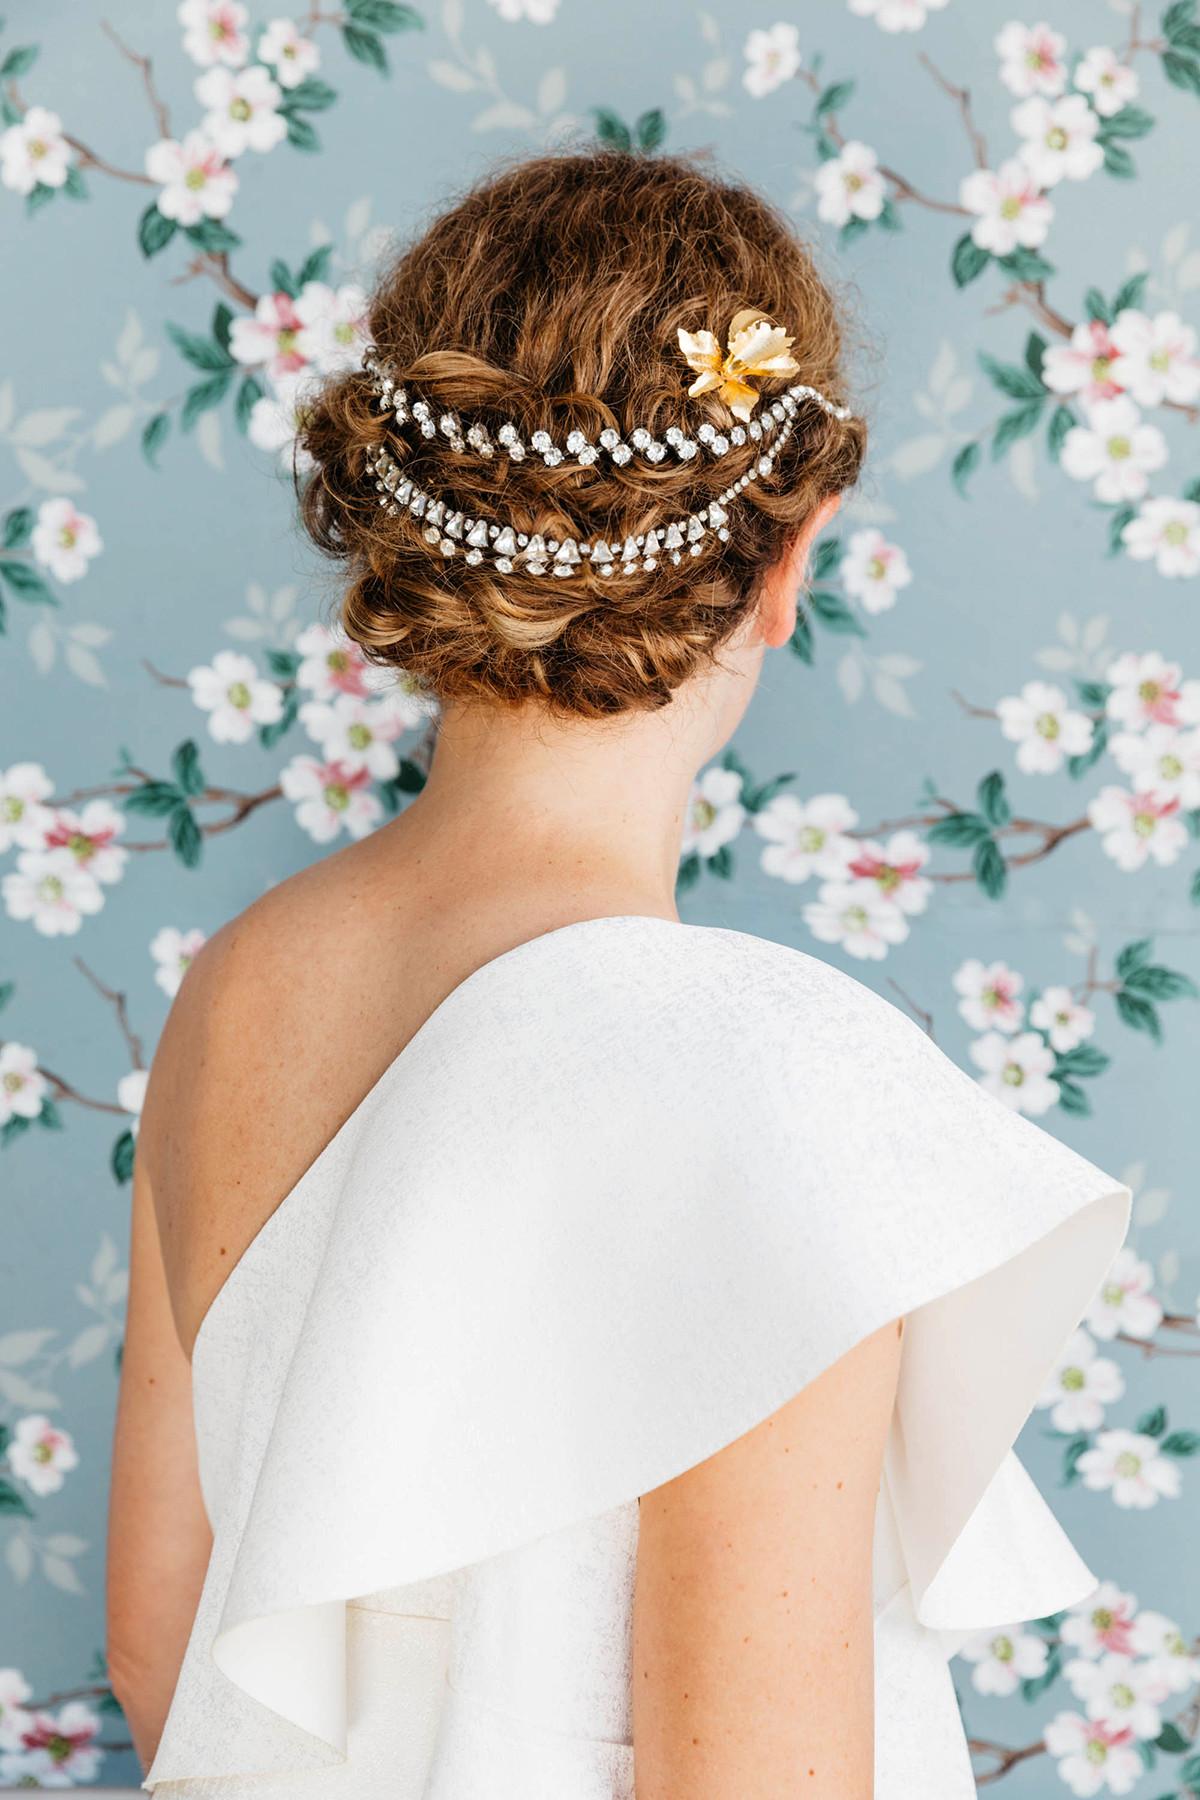 DIY Bridal Hair  DIY Hair Accessories With Vintage Jewelry – Honestly WTF